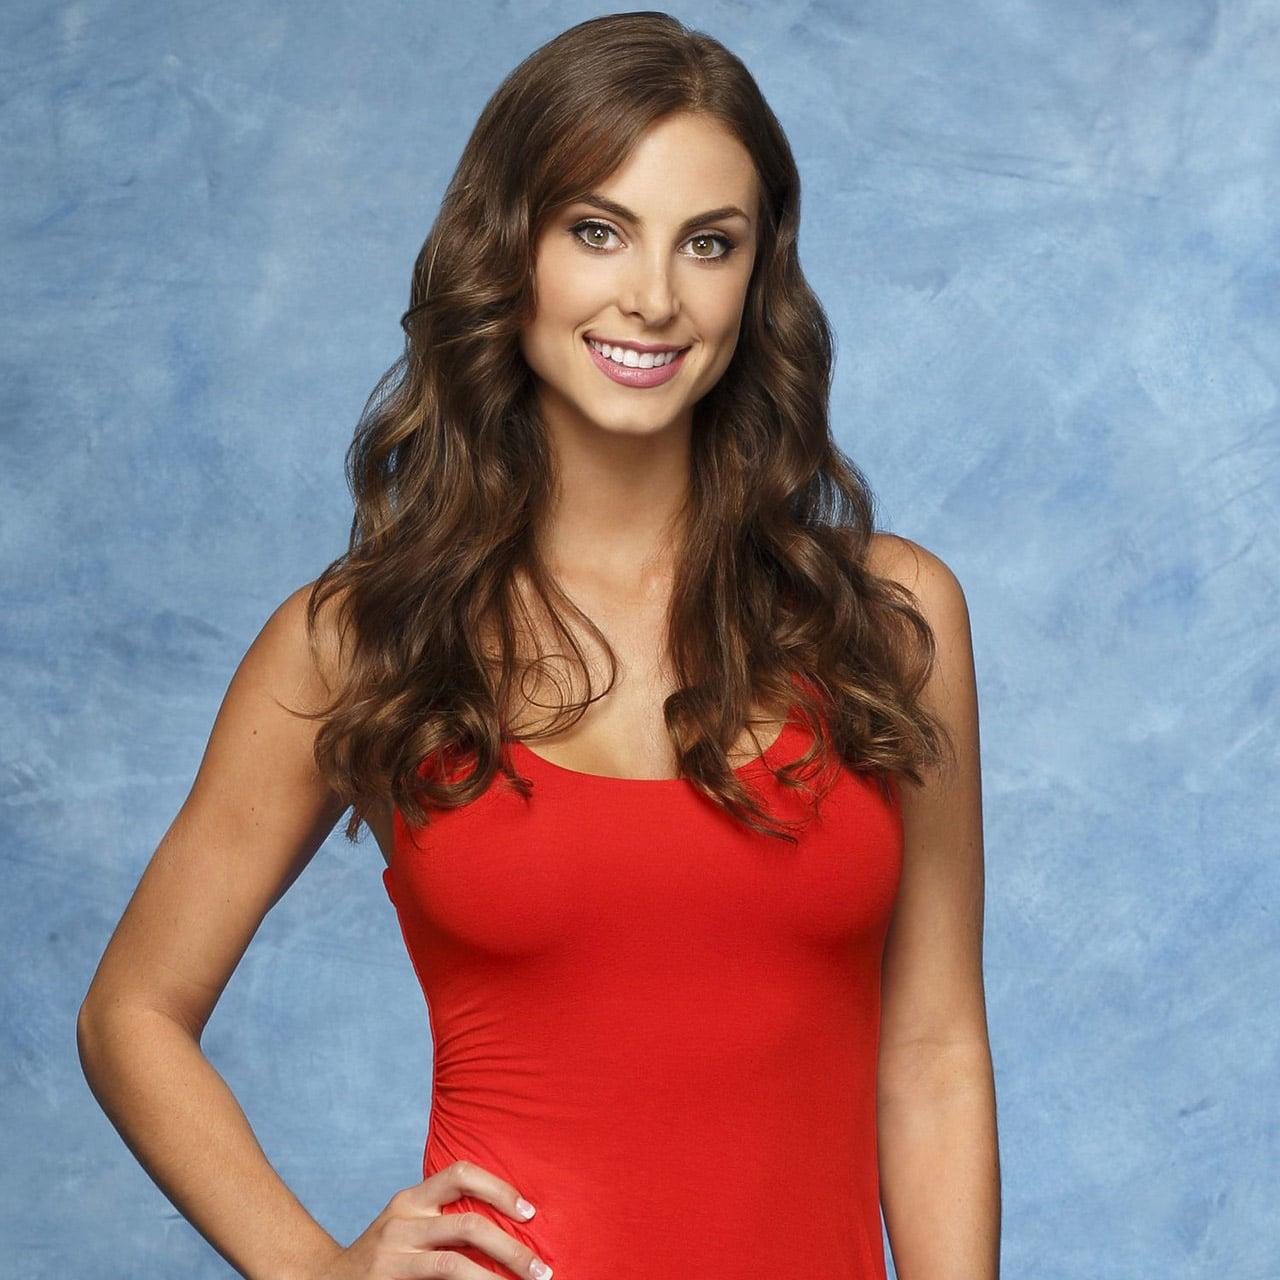 Cassandra from the bachelor 2018